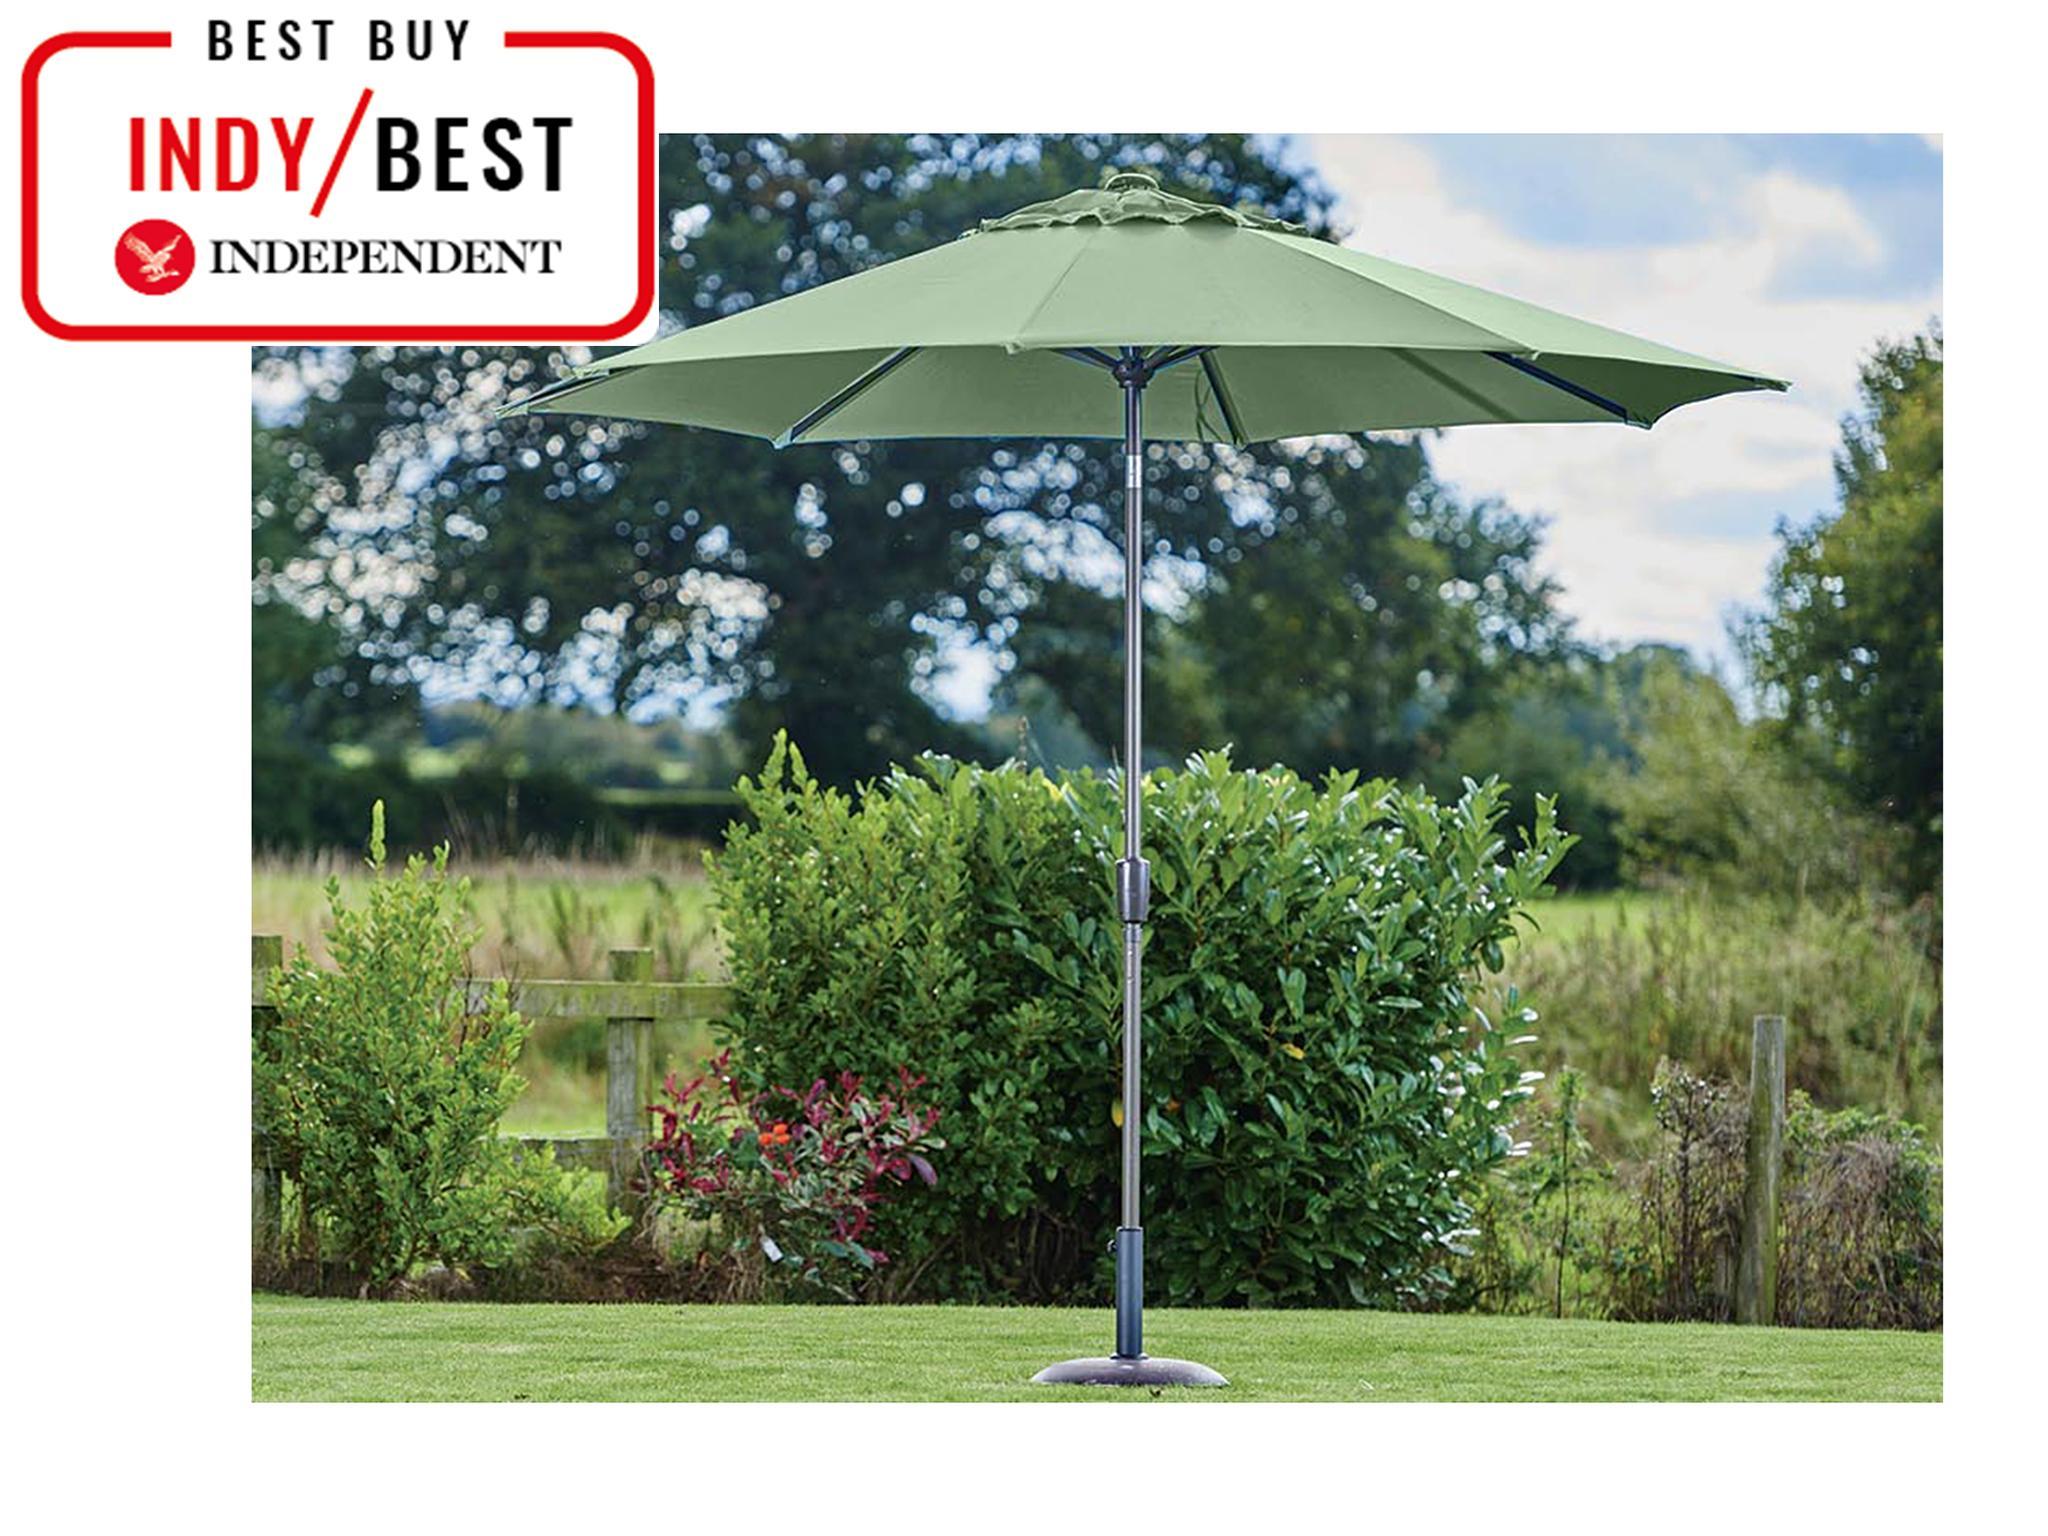 Alfresco Deluxe Rain Cover for Standard Parasol Waterproof UV Resistant